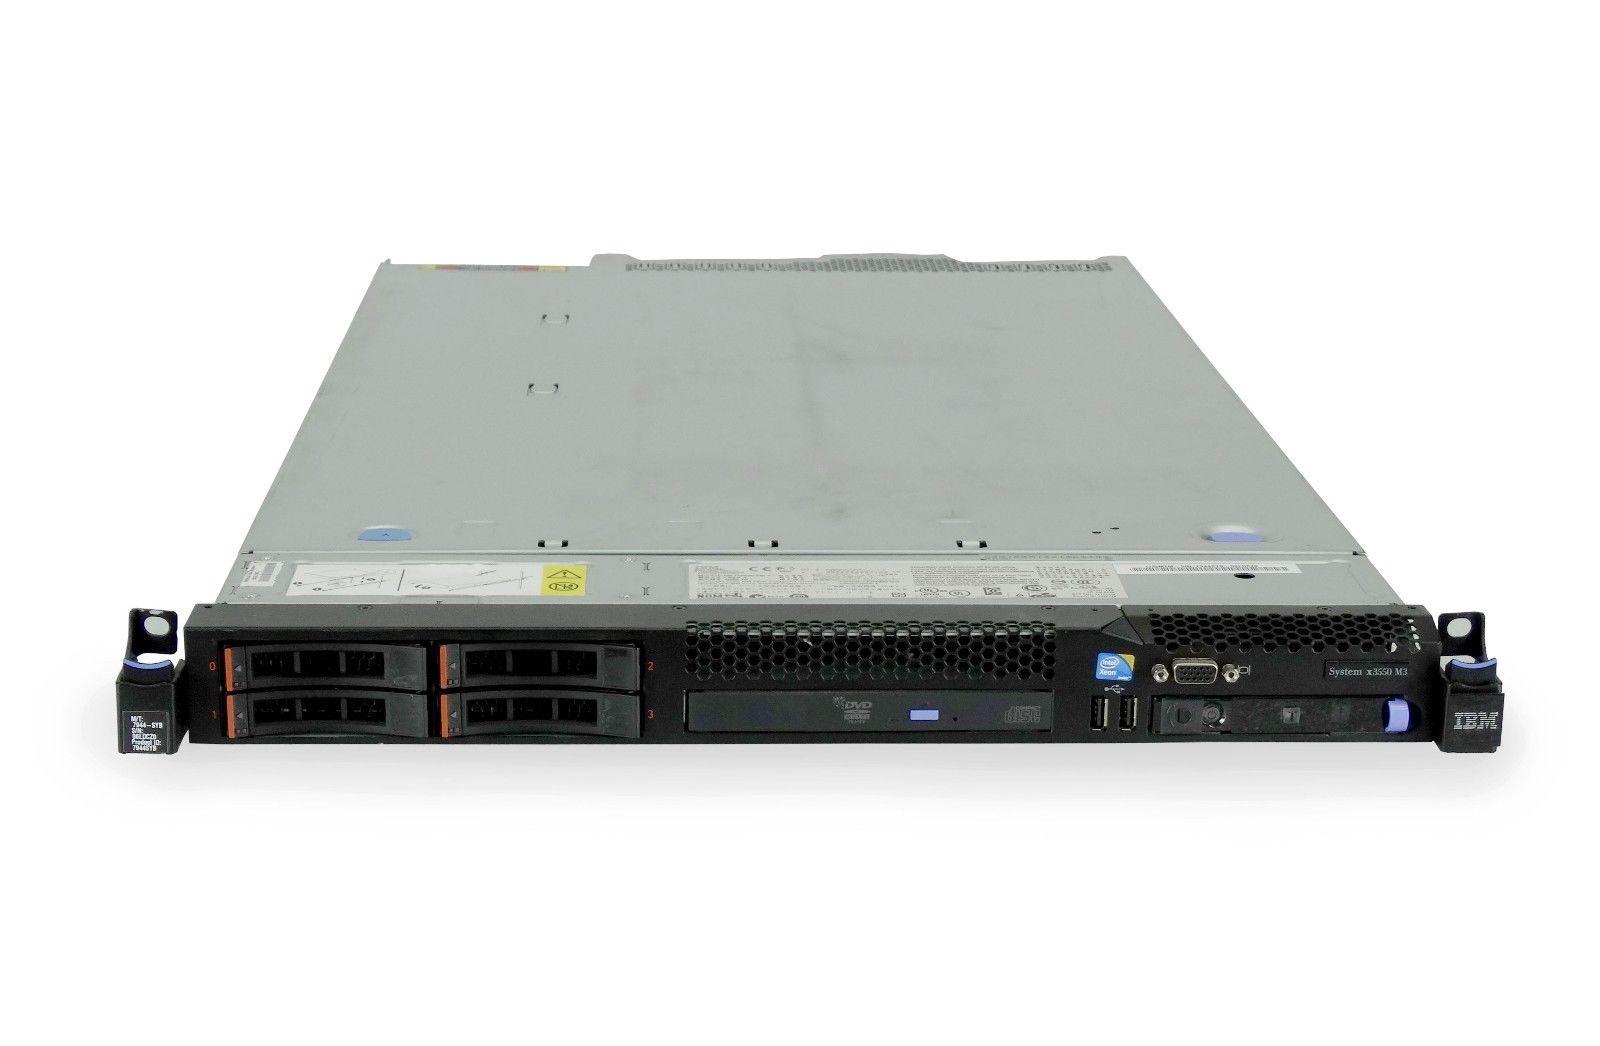 Lenovo System x3550 M3 4-Bay SFF 1U Rackmount Server